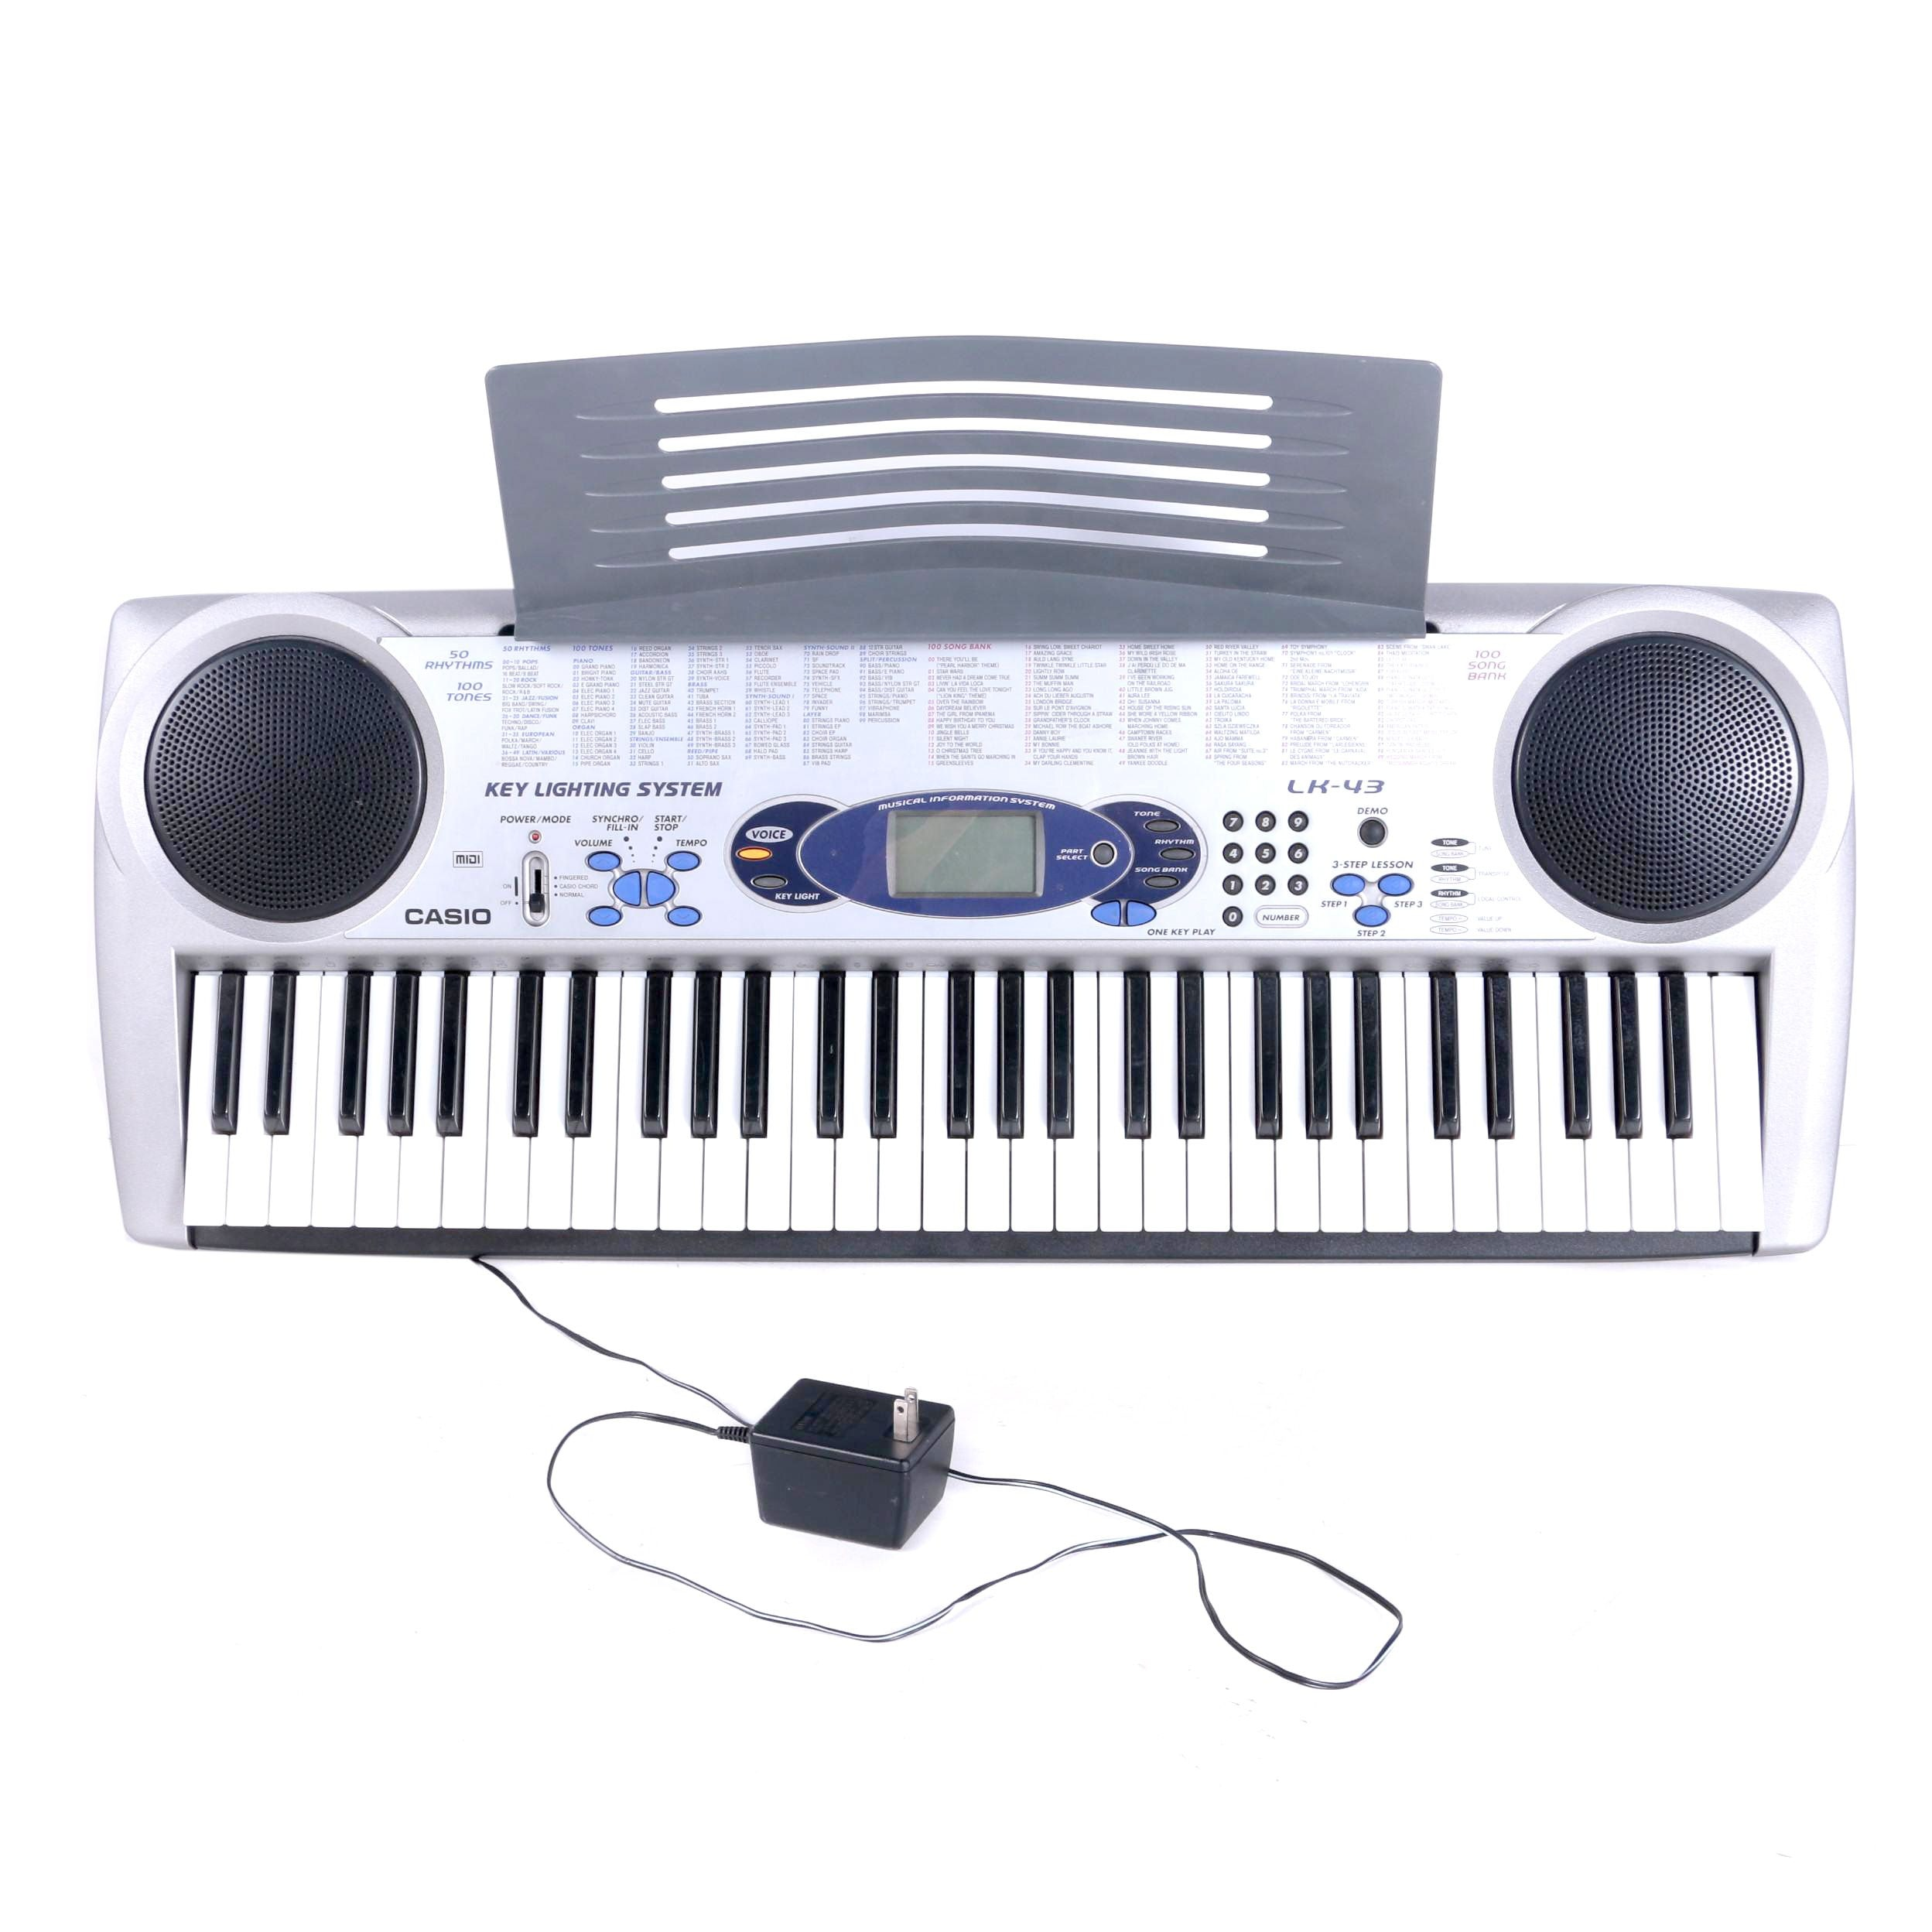 casio lighted electronic keyboard ebth rh ebth com Electronic Keyboard Casio Lk 43 Electronic Keyboard Casio Lk 43